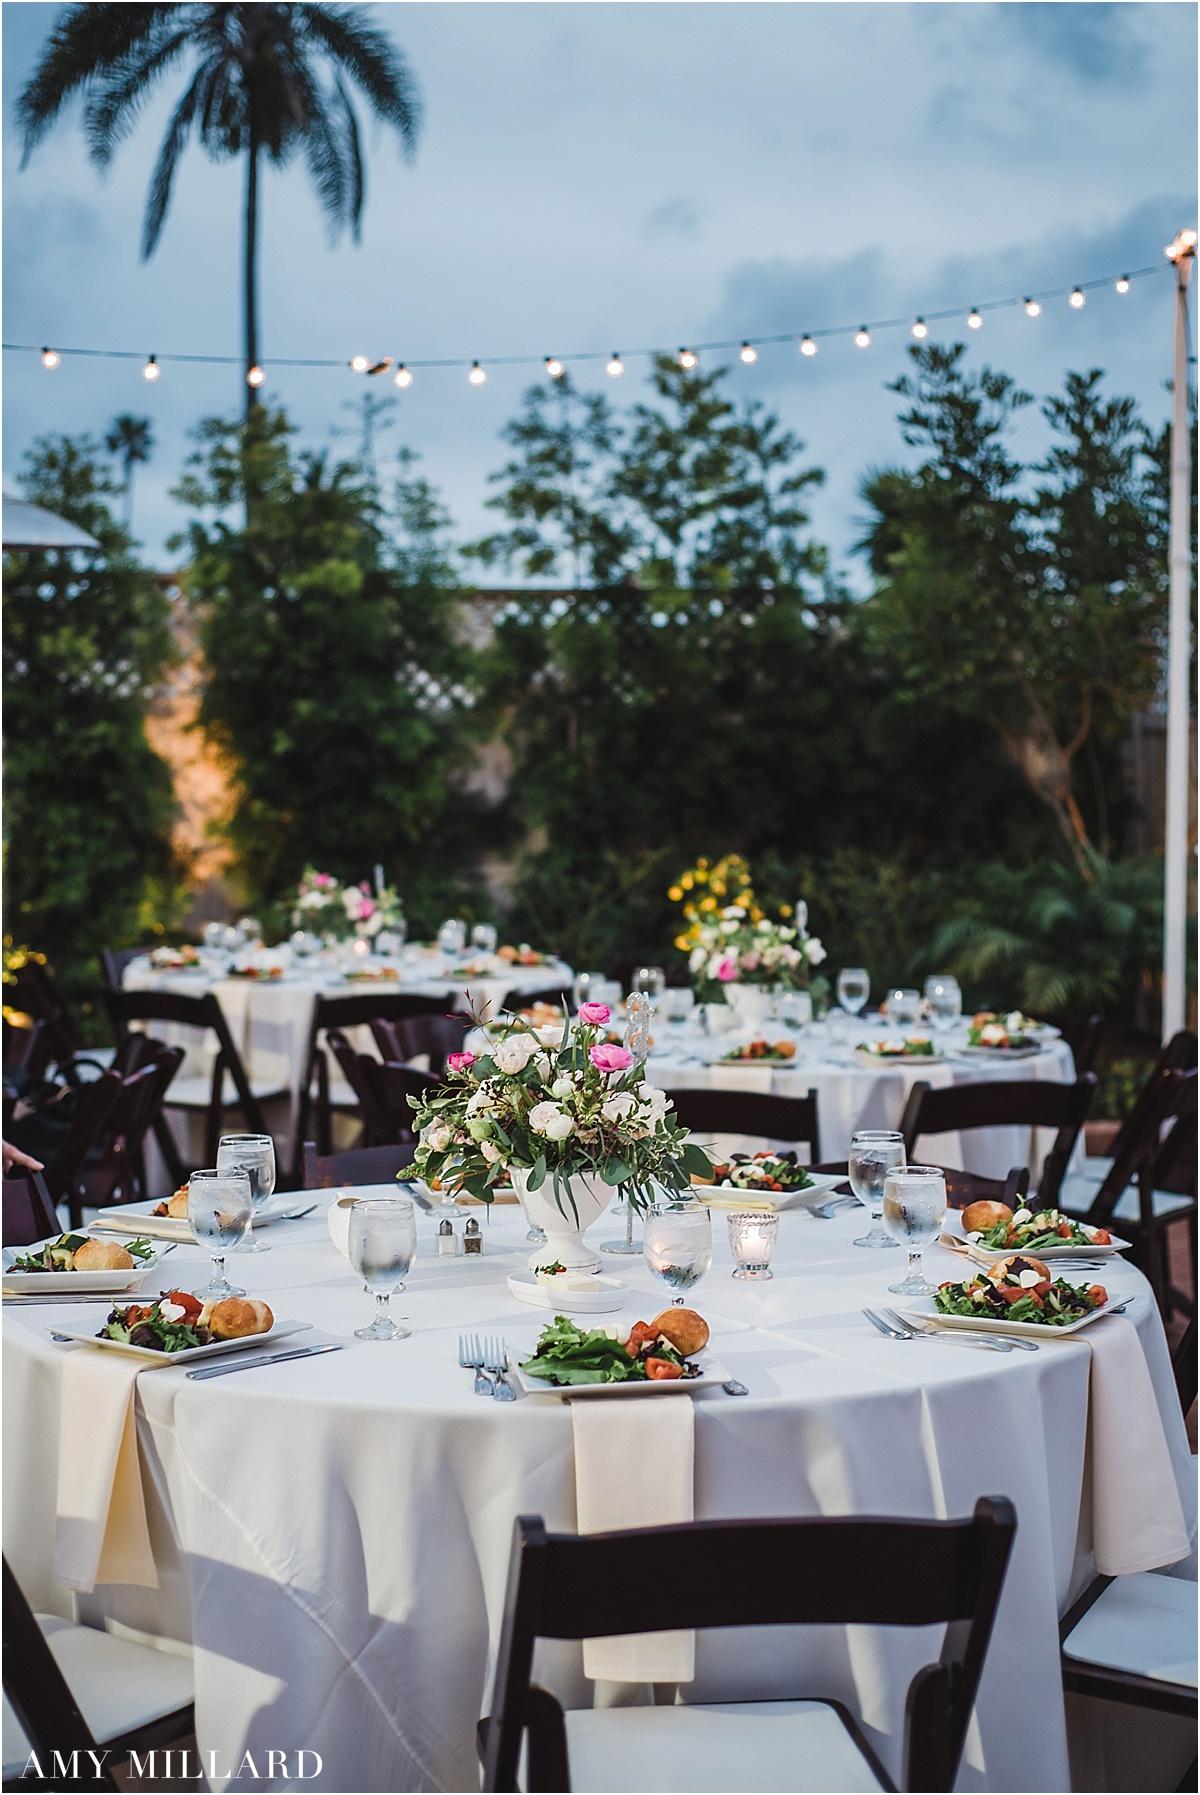 receptionflowers5.jpg